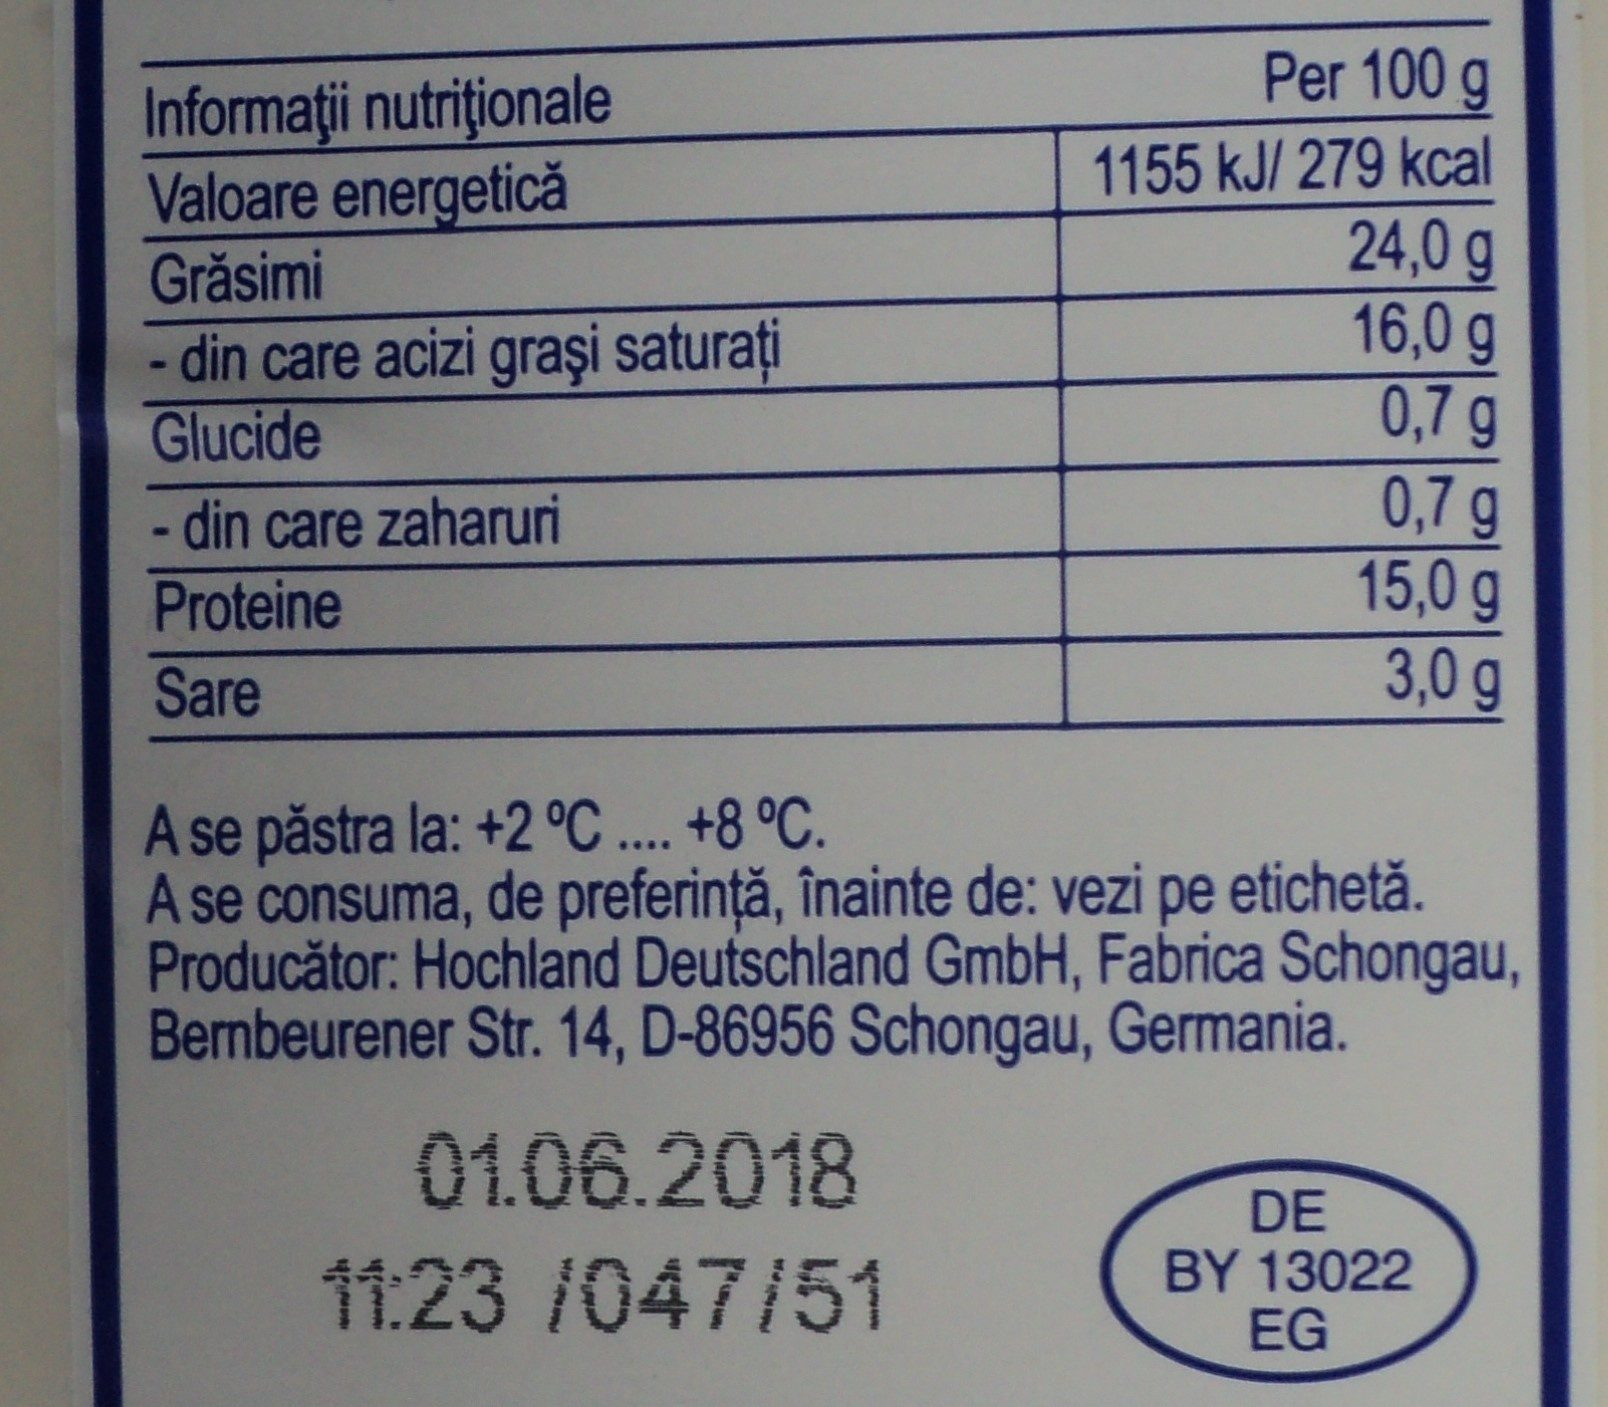 Hochland Telemea de vaca - Informations nutritionnelles - ro